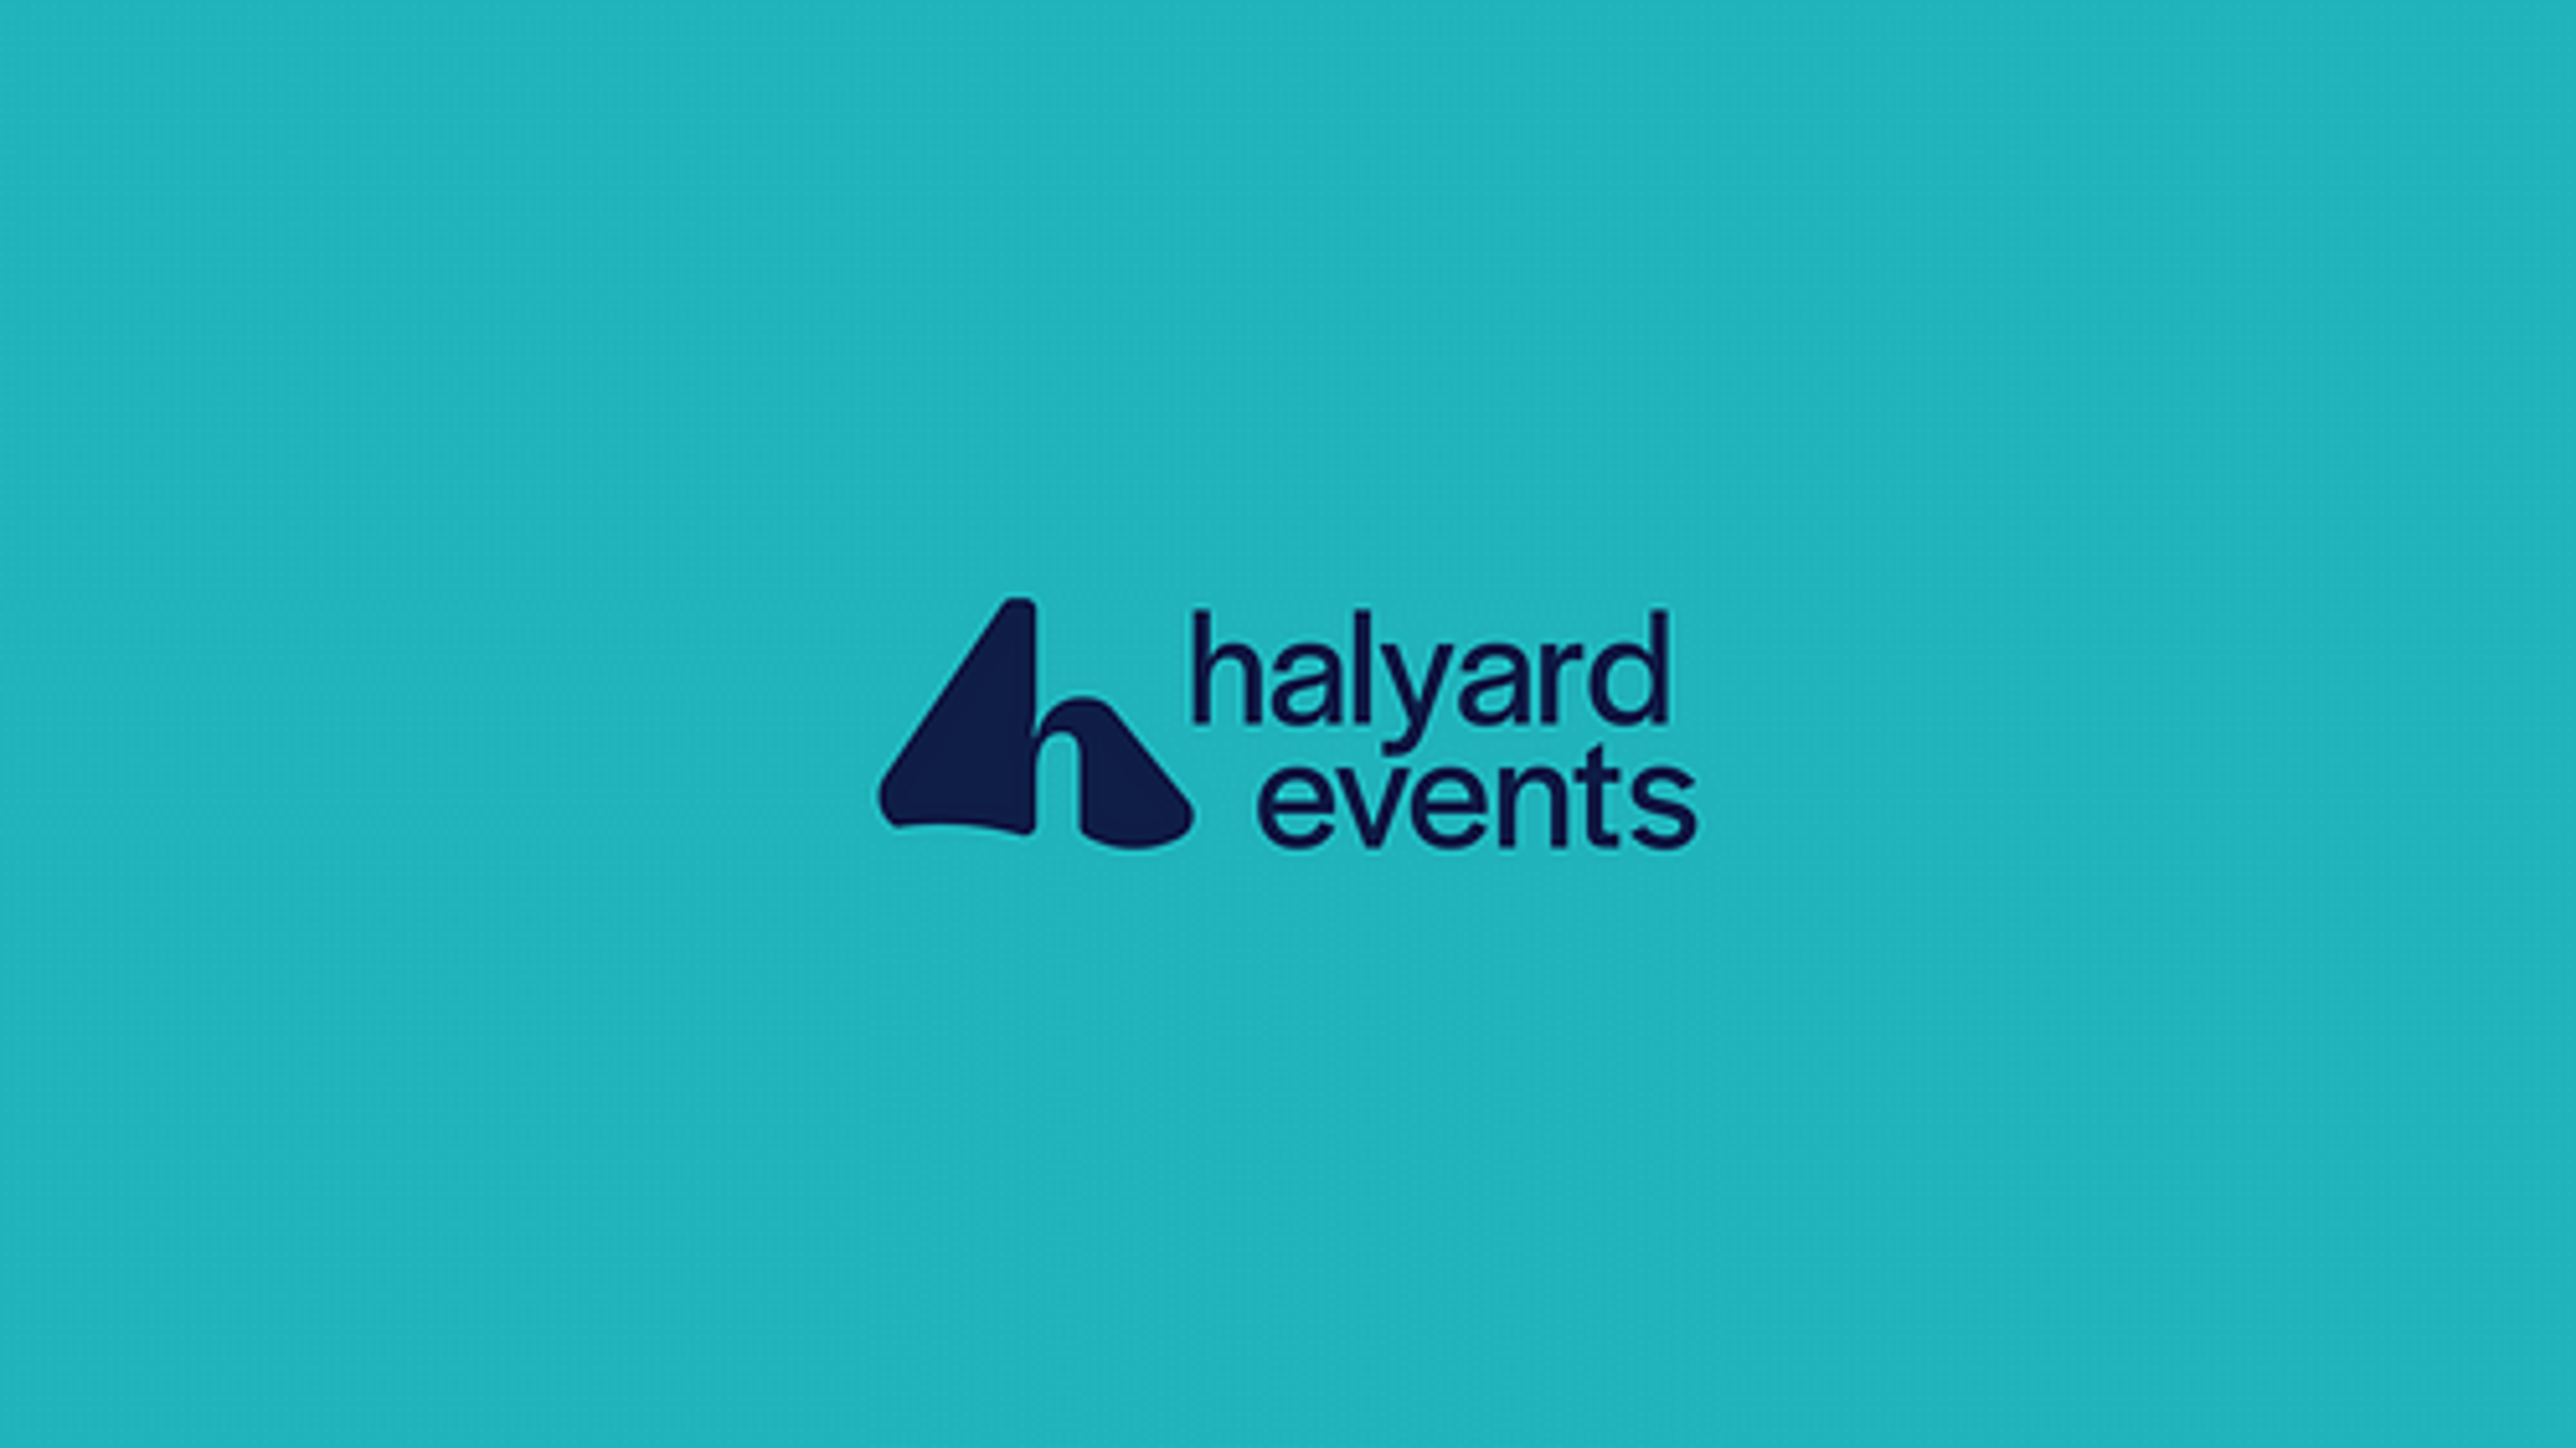 Halyard Events - Branding & Positioning